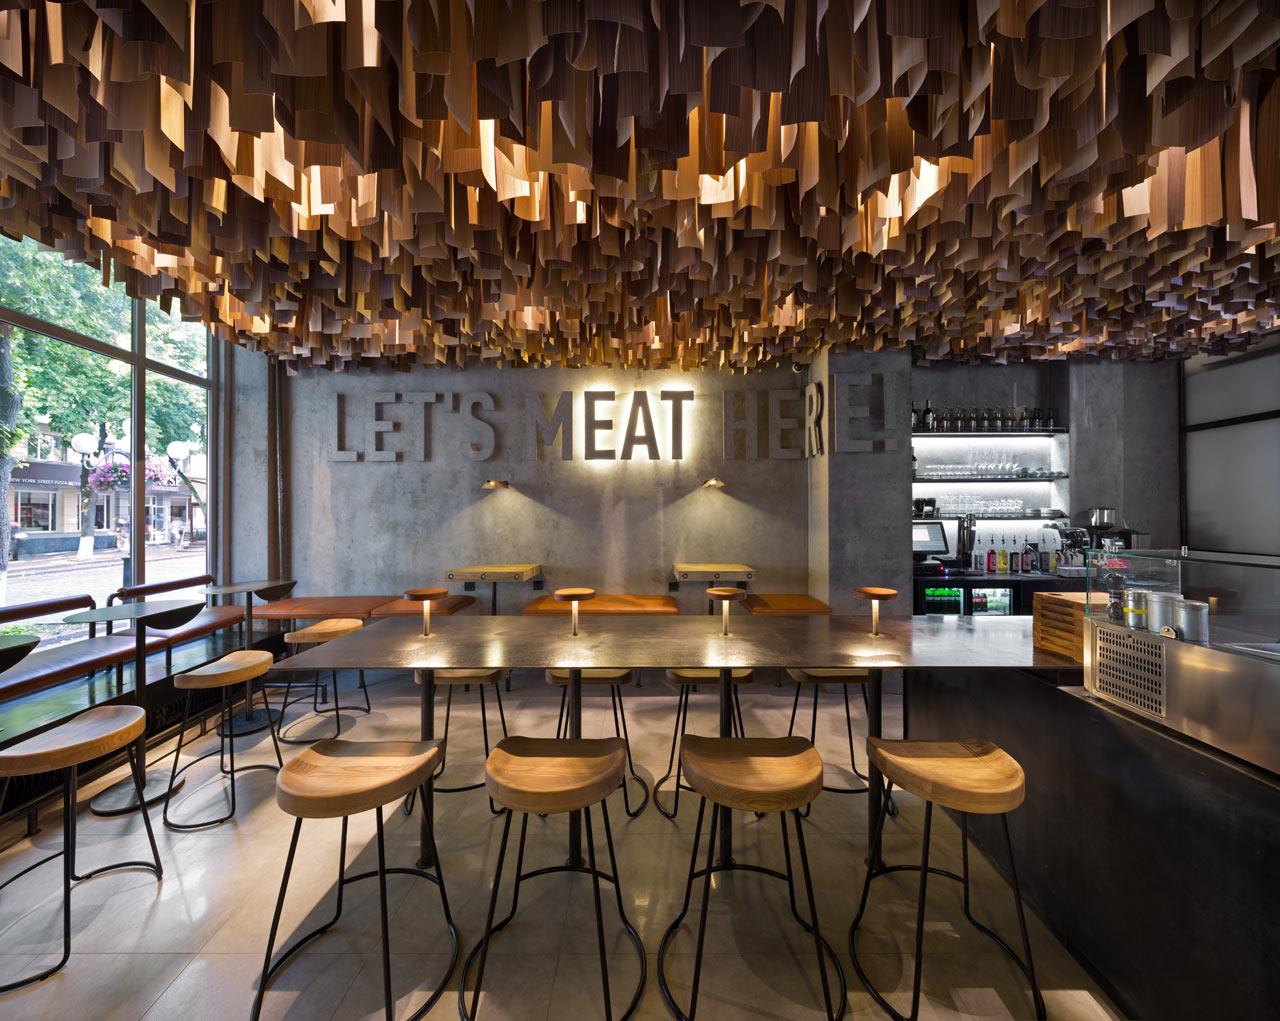 Shade Burger Restaurant Branding & Interior Design – Grits Grids